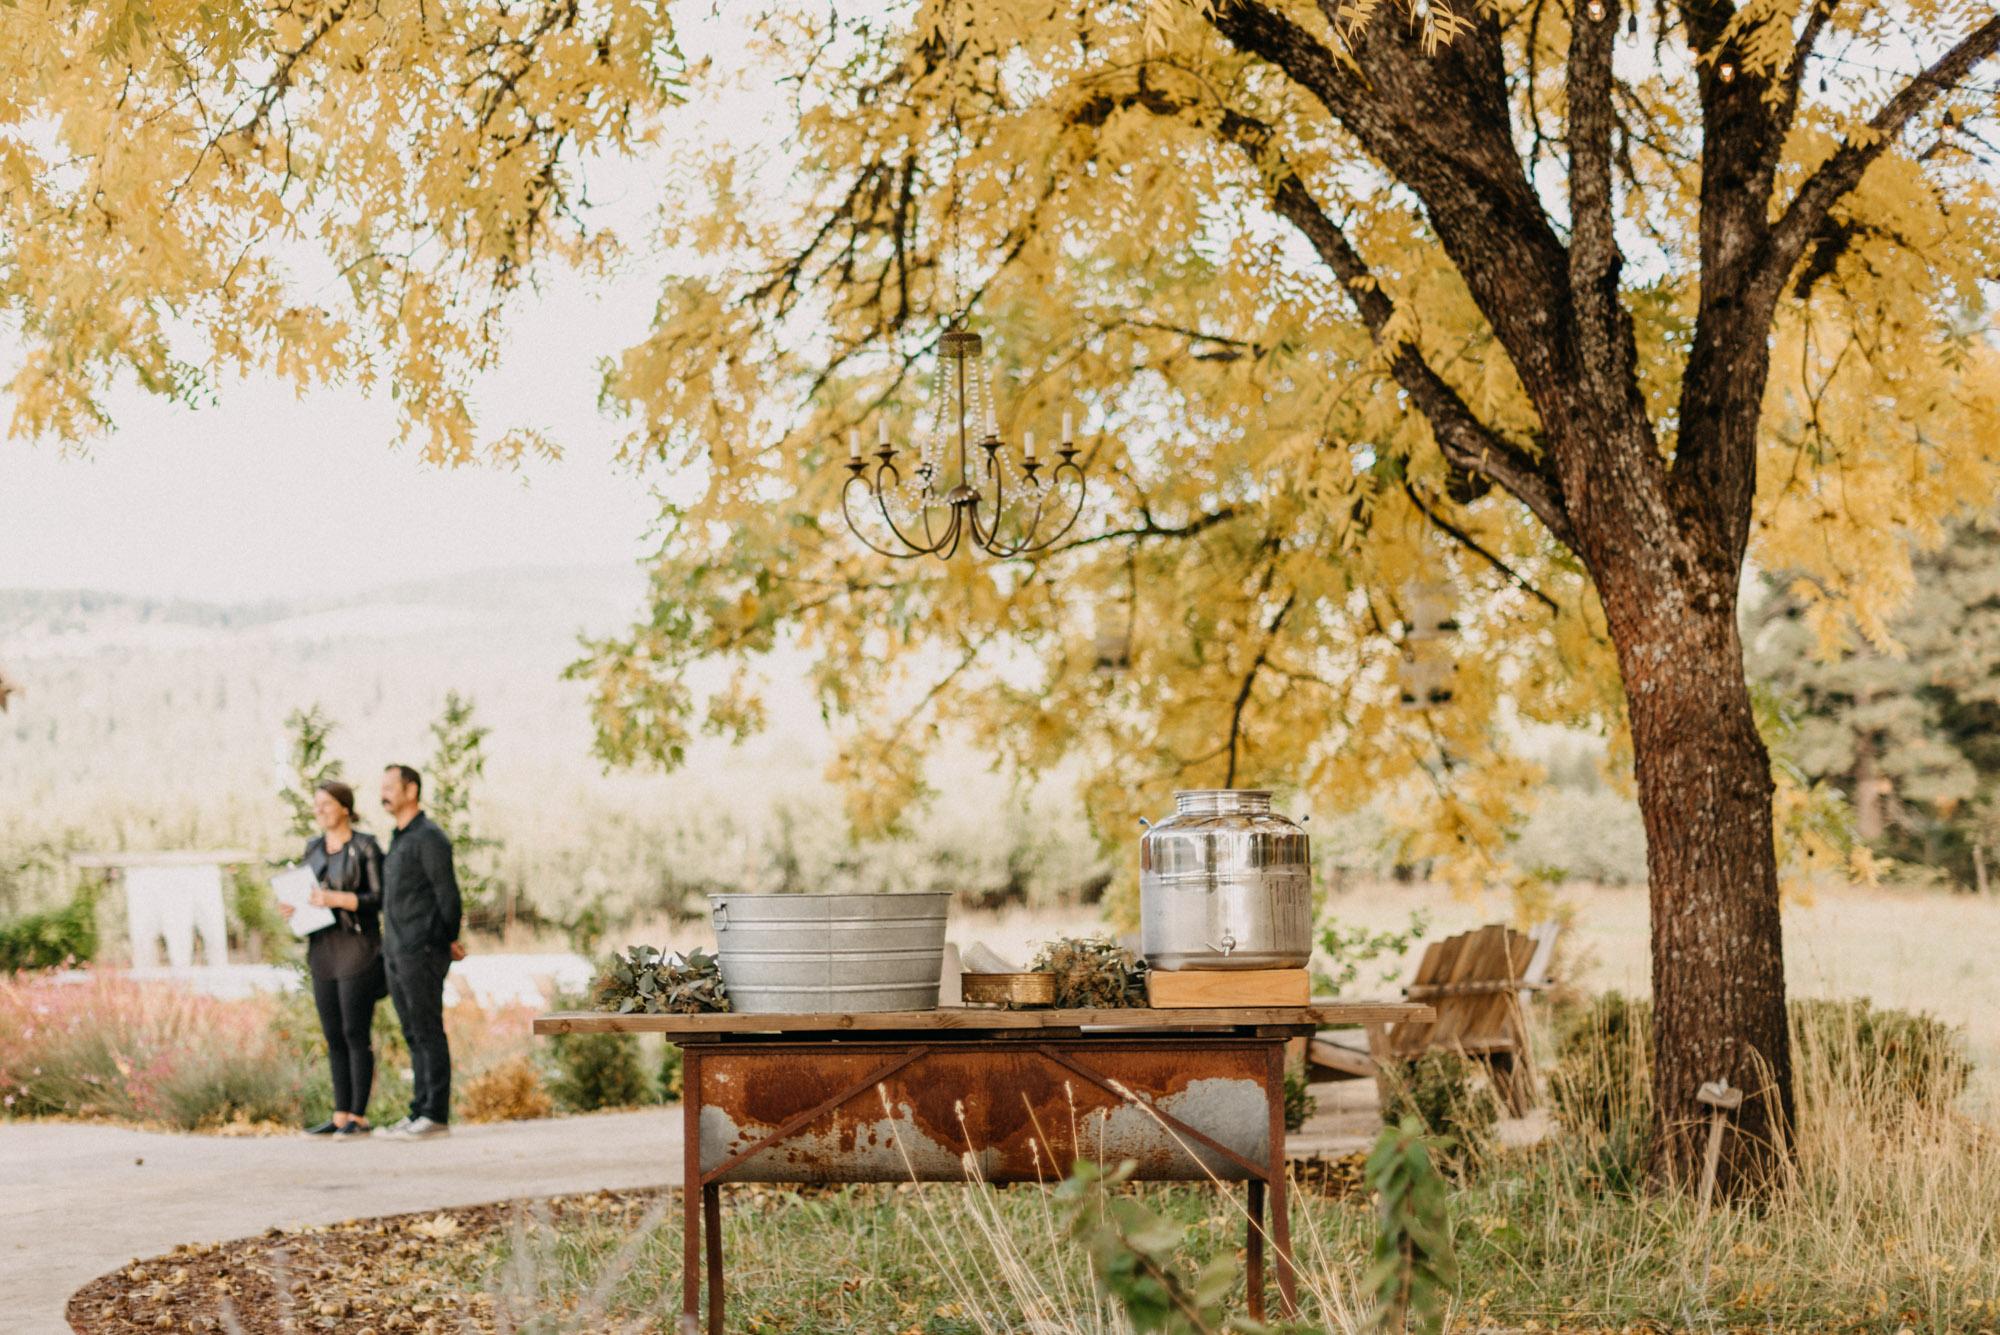 Getting-Ready-Swingset-Washington-Wedding-ringshot-8809.jpg